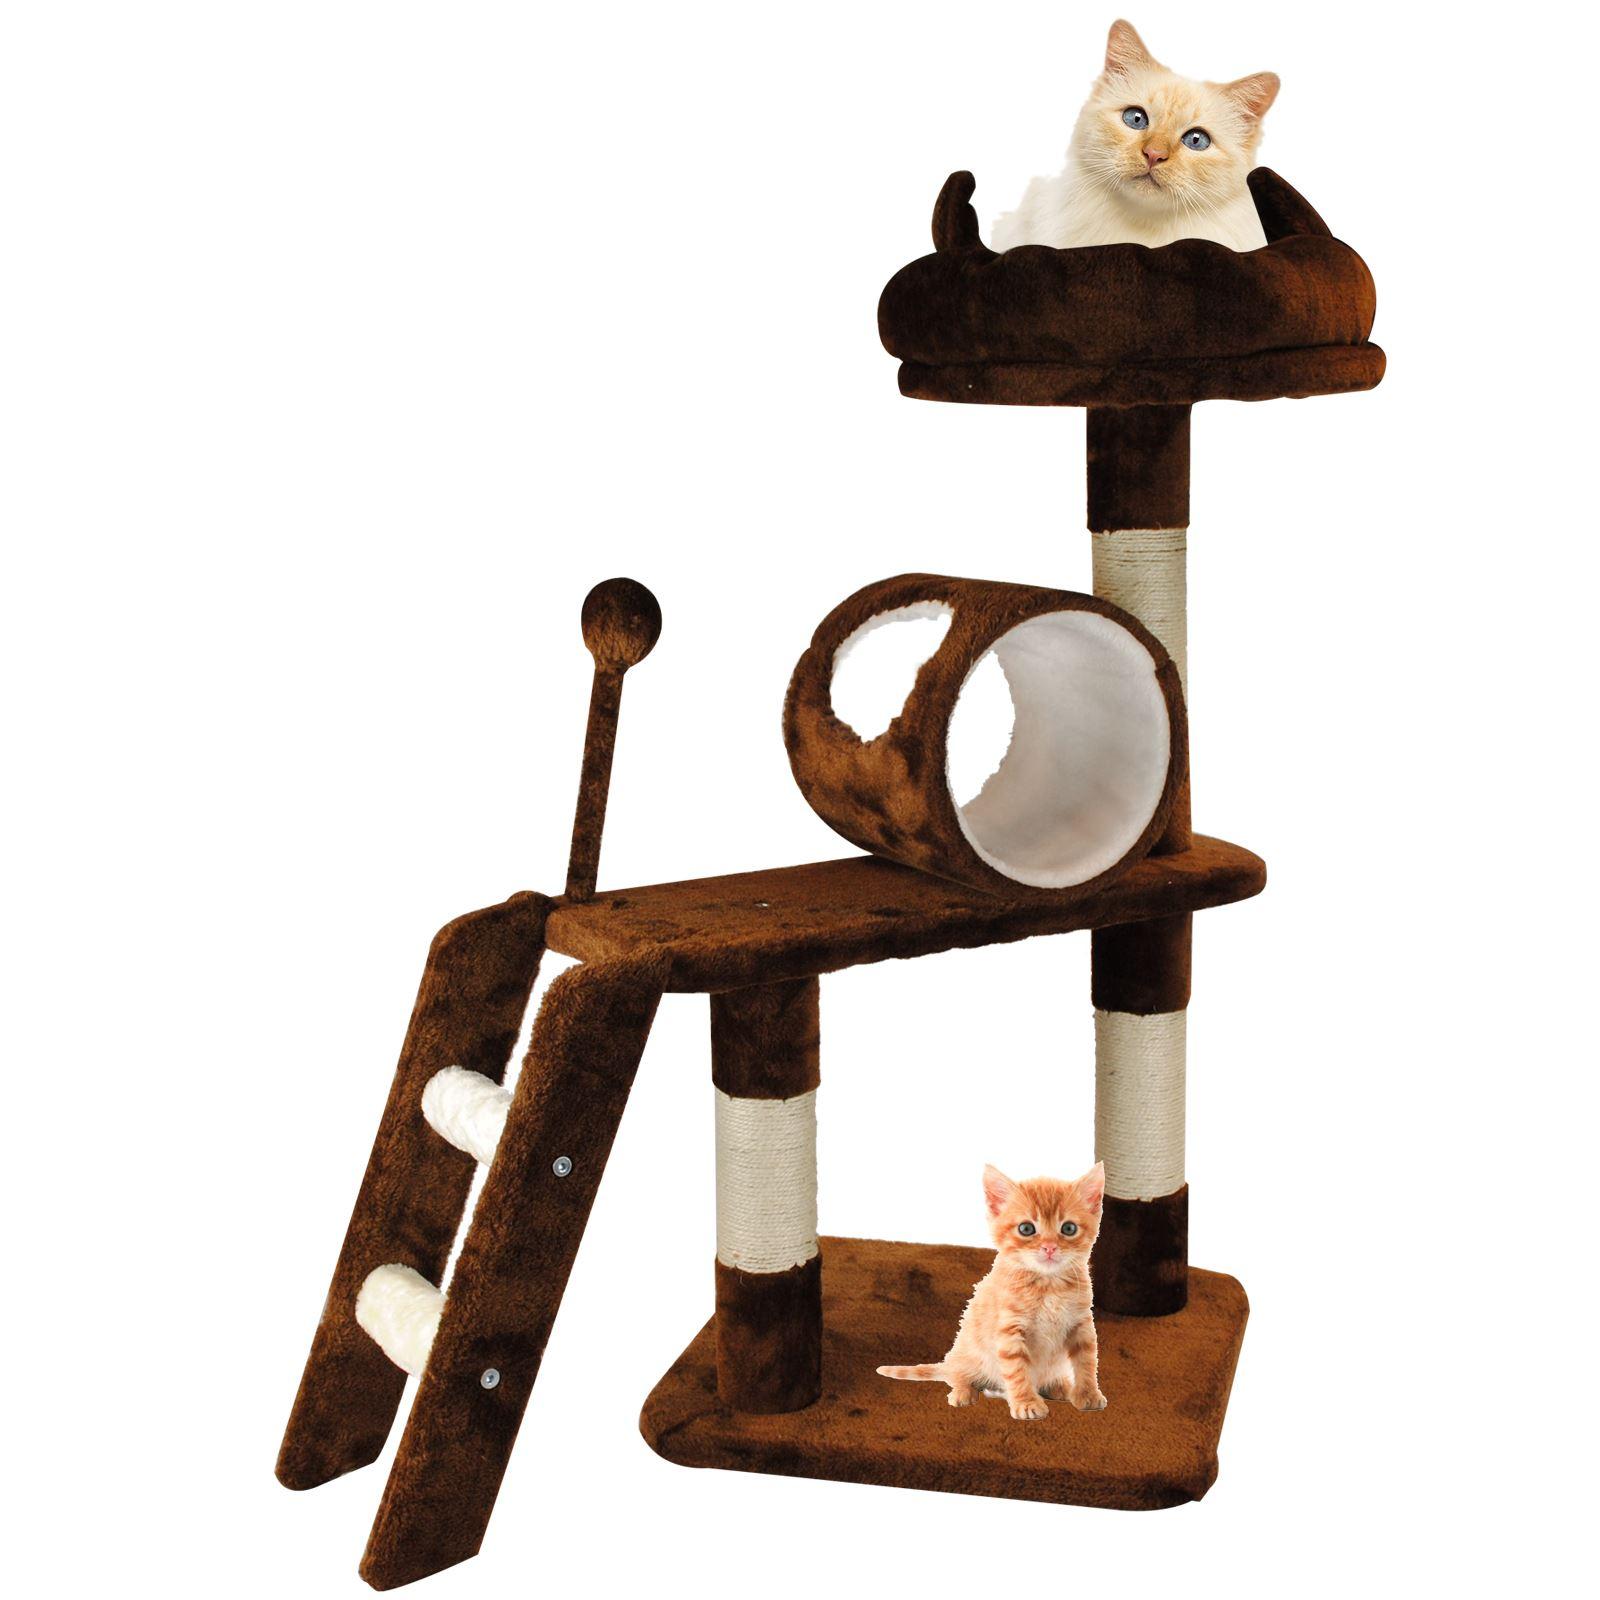 children climbing on furniture